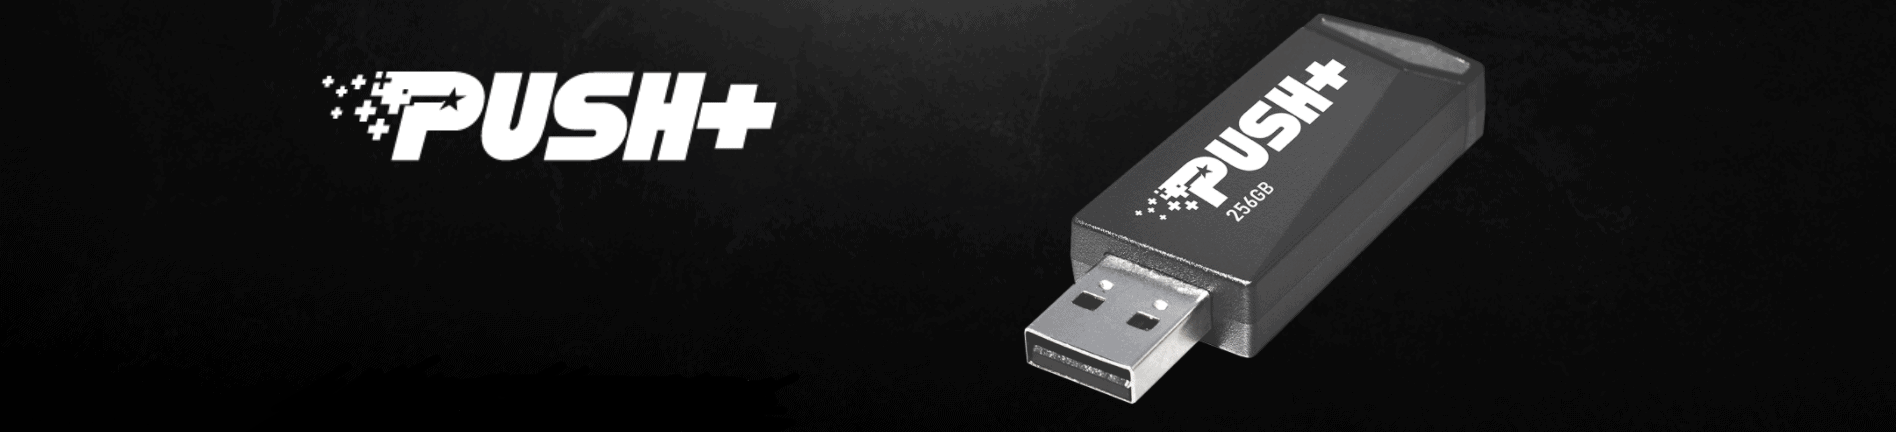 A PATRIOT™ BEMUTATTA A PUSH+ USB FLASH MEGHAJTÓT